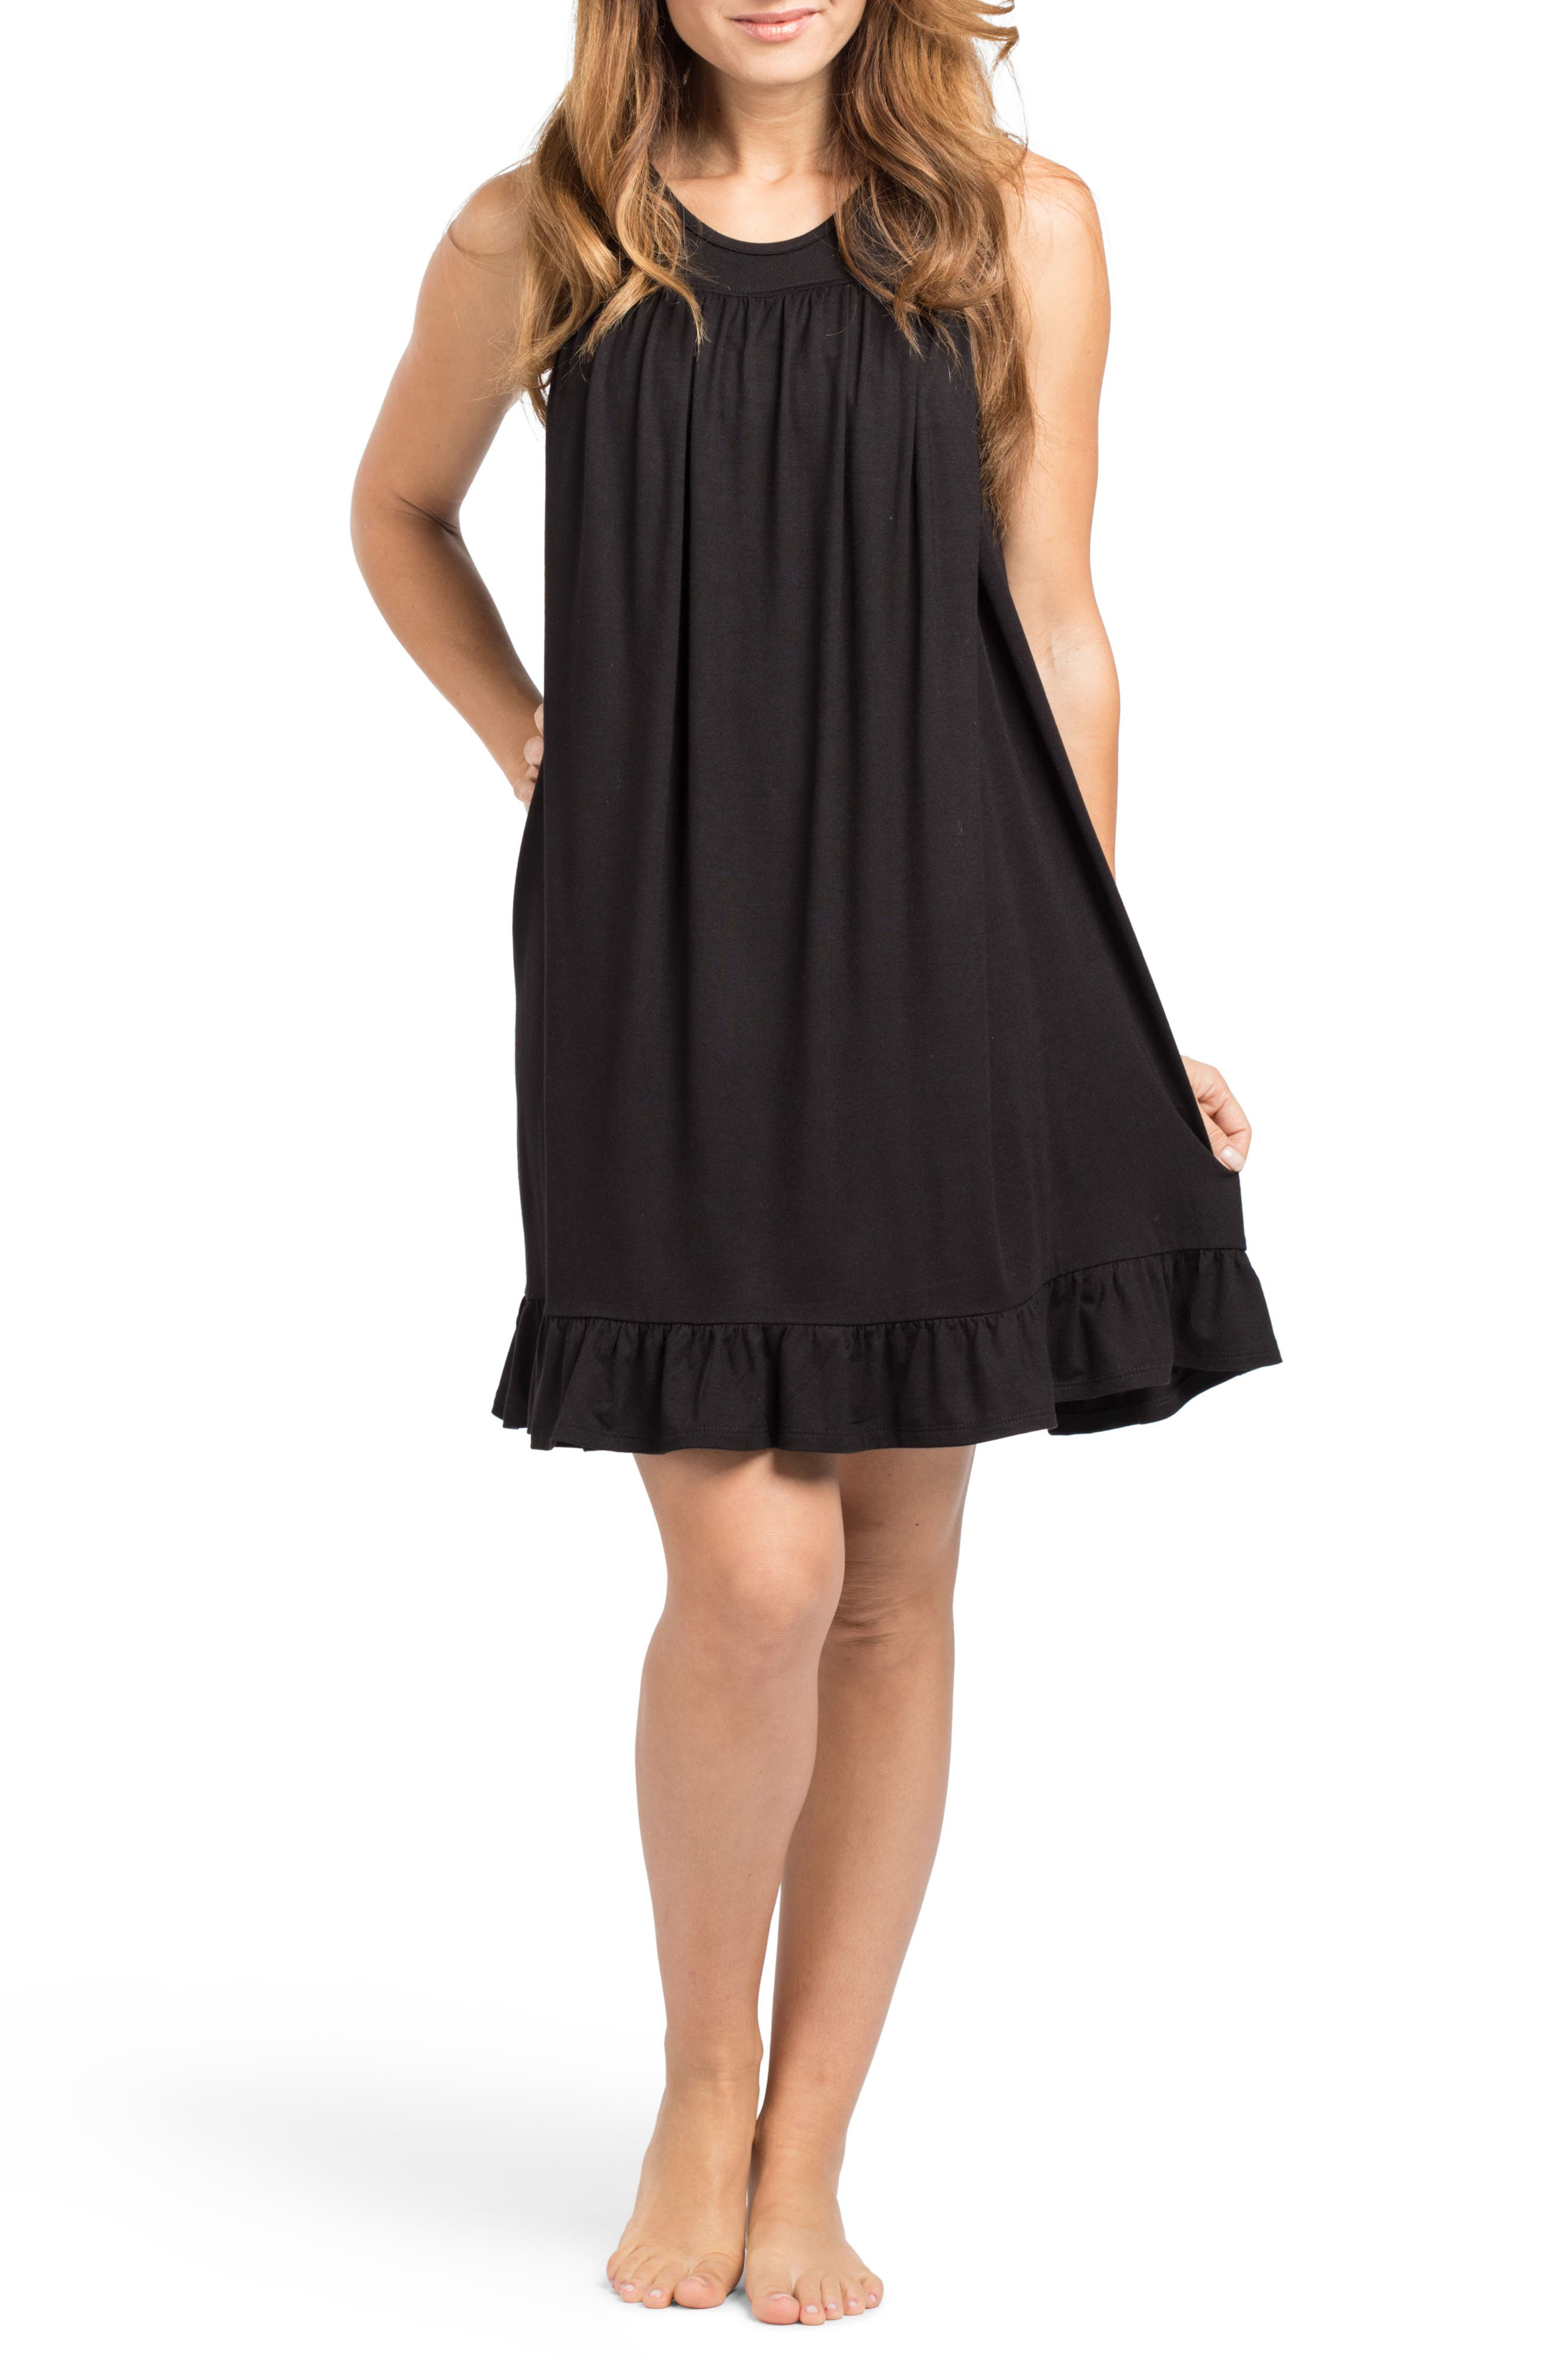 'The Ruffled' Sleeveless Maternity/Nursing Nightgown, Main, color, BLACK